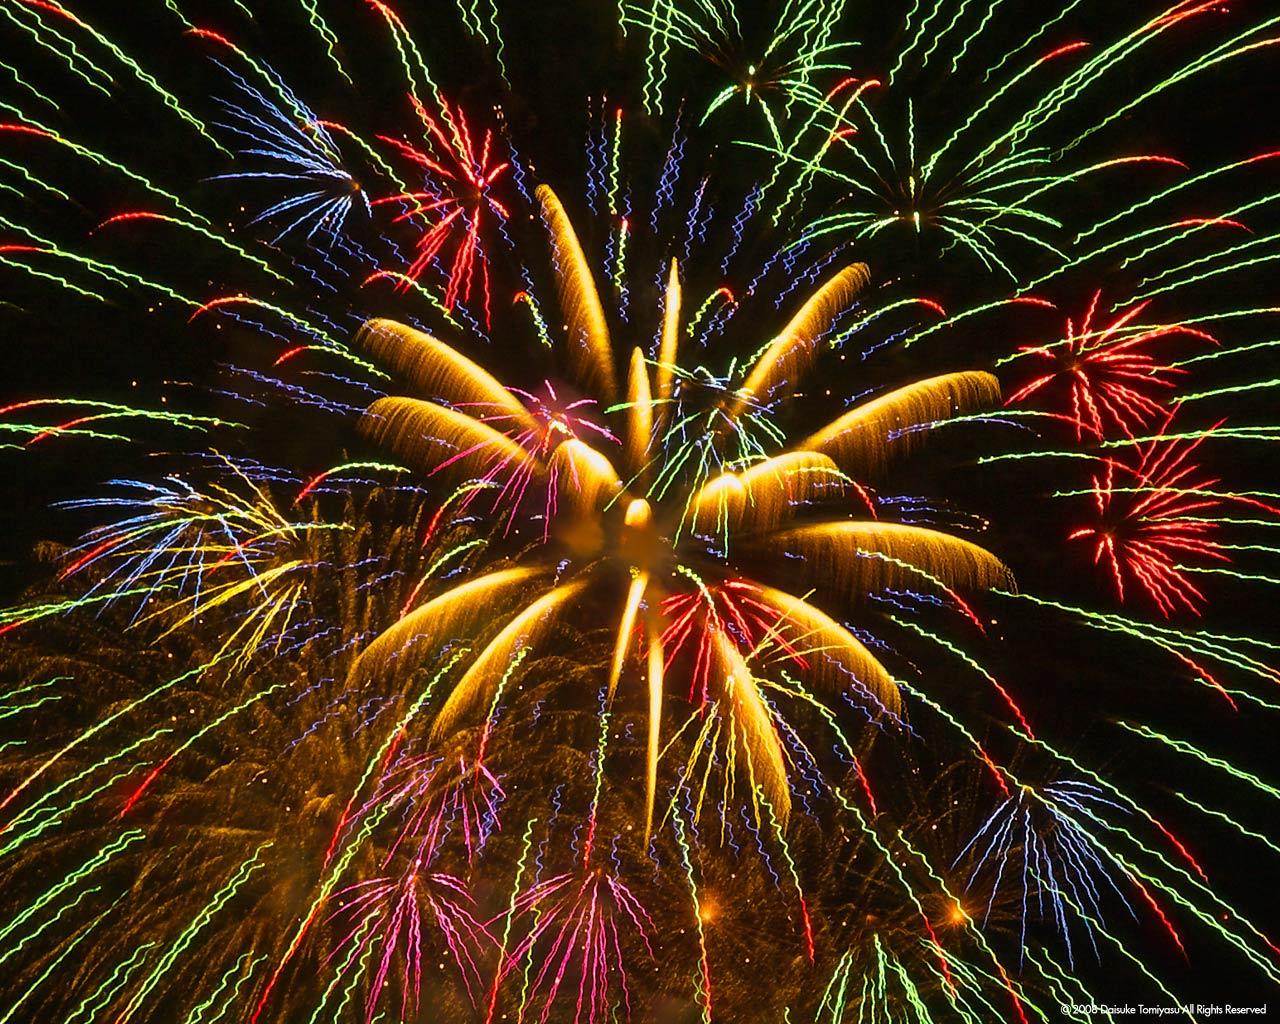 http://2.bp.blogspot.com/_2YqMnHAsMwM/TLihj5ujHKI/AAAAAAAAAmY/3AThP05r2eA/s1600/free-fireworks-clip-art.jpg